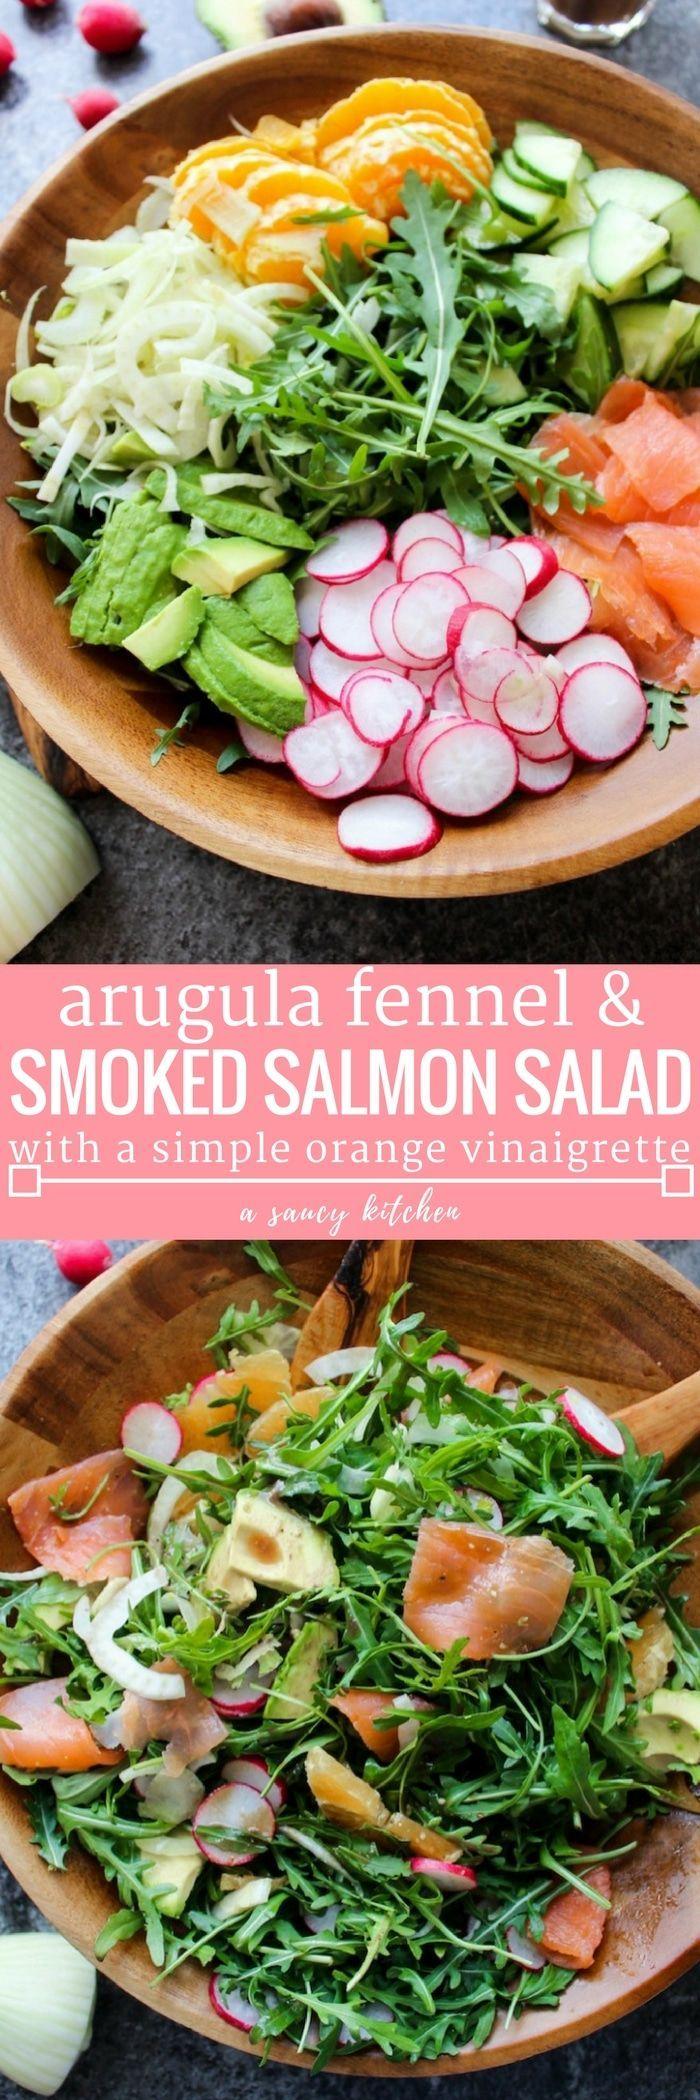 Arugula Fennel & Smoked Salmon Salad with radish, cucumber, oranges, and avocado topped in a simple orange vinaigrette | Paleo + Gluten Free